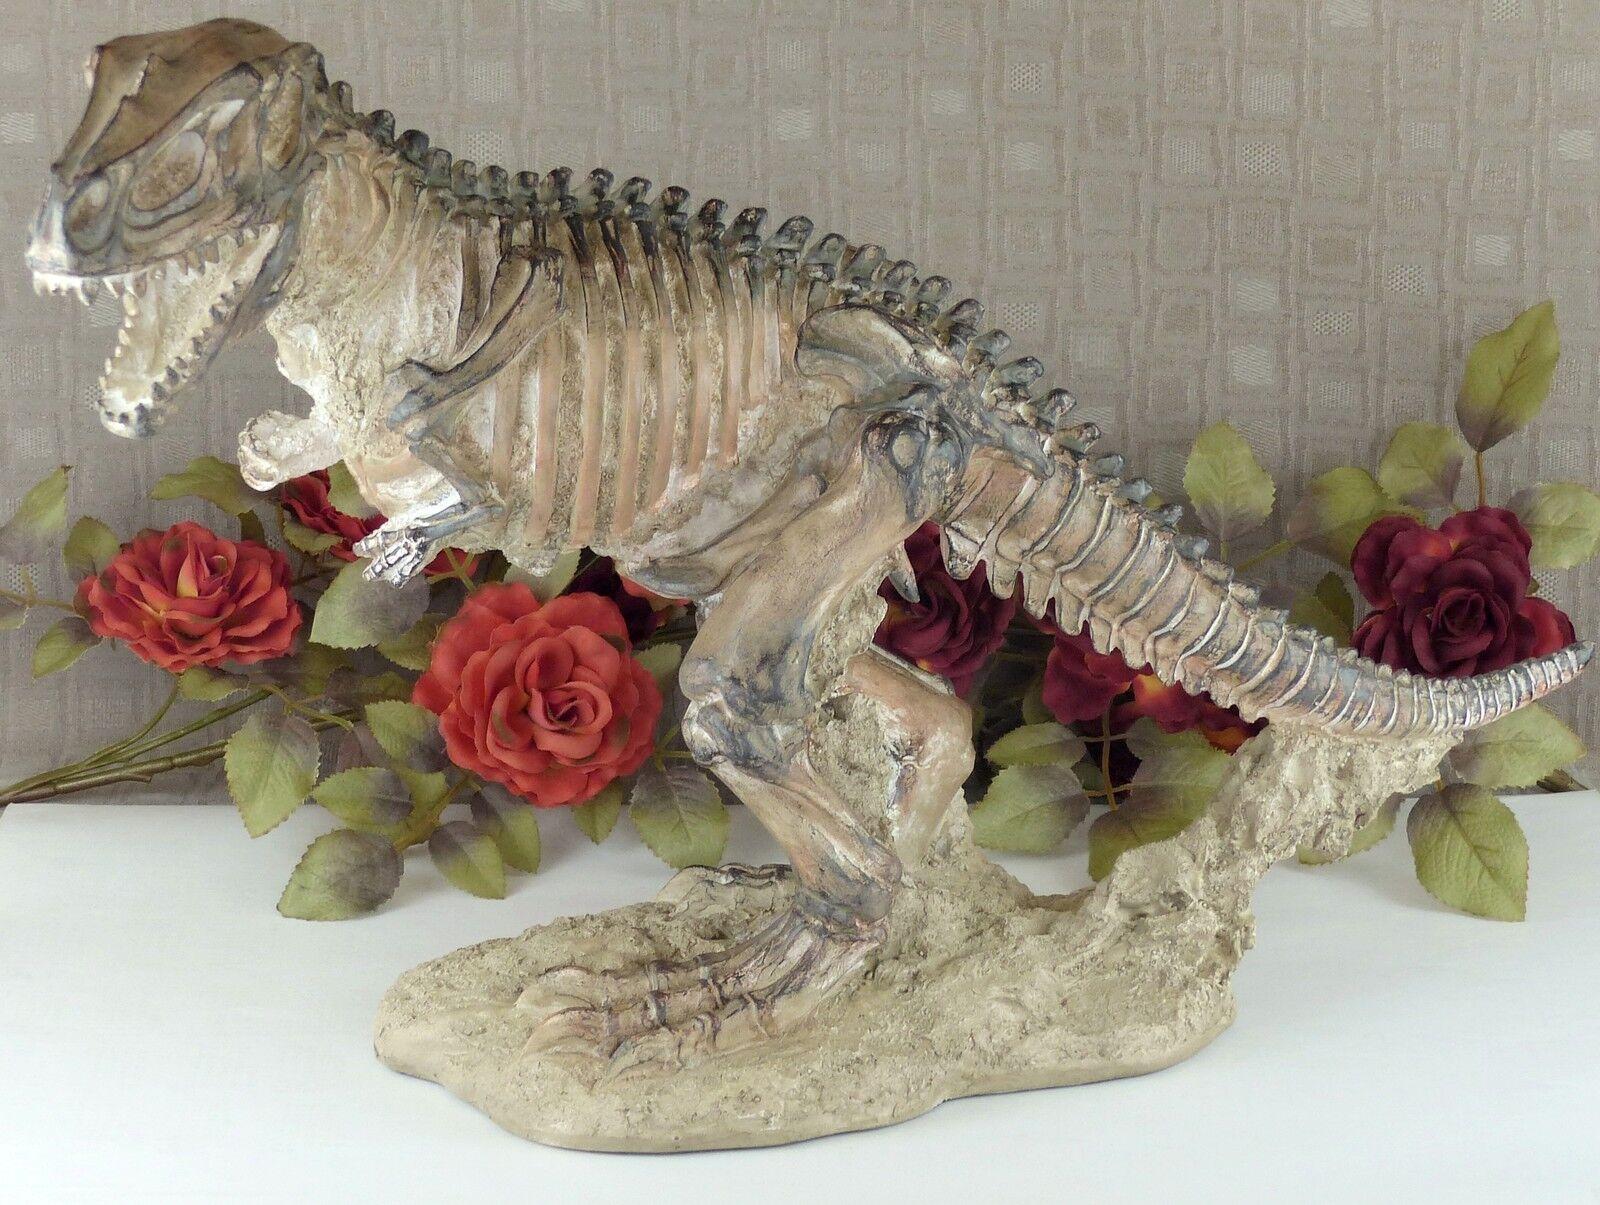 XXL dinosaurios personaje escultura esqueleto tiranosaurio fossil animal personaje Jurassic